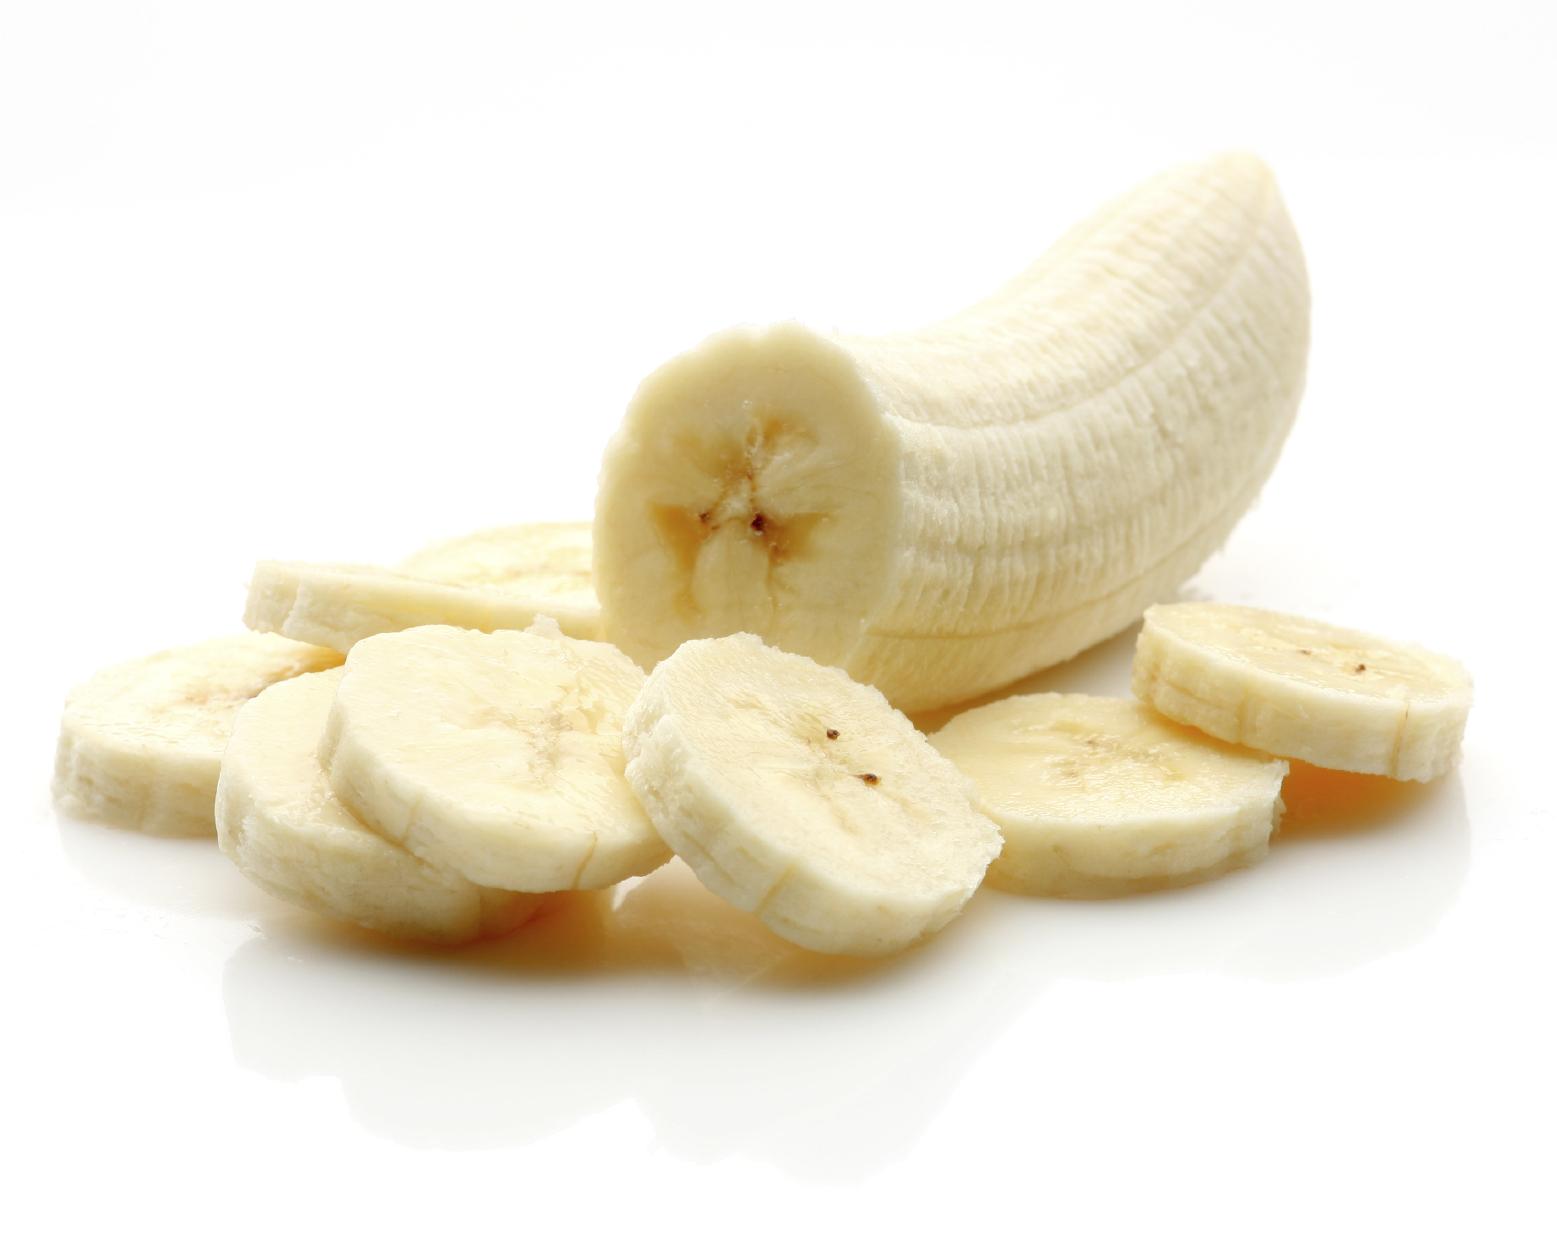 Two bananas up my fuck holes 7